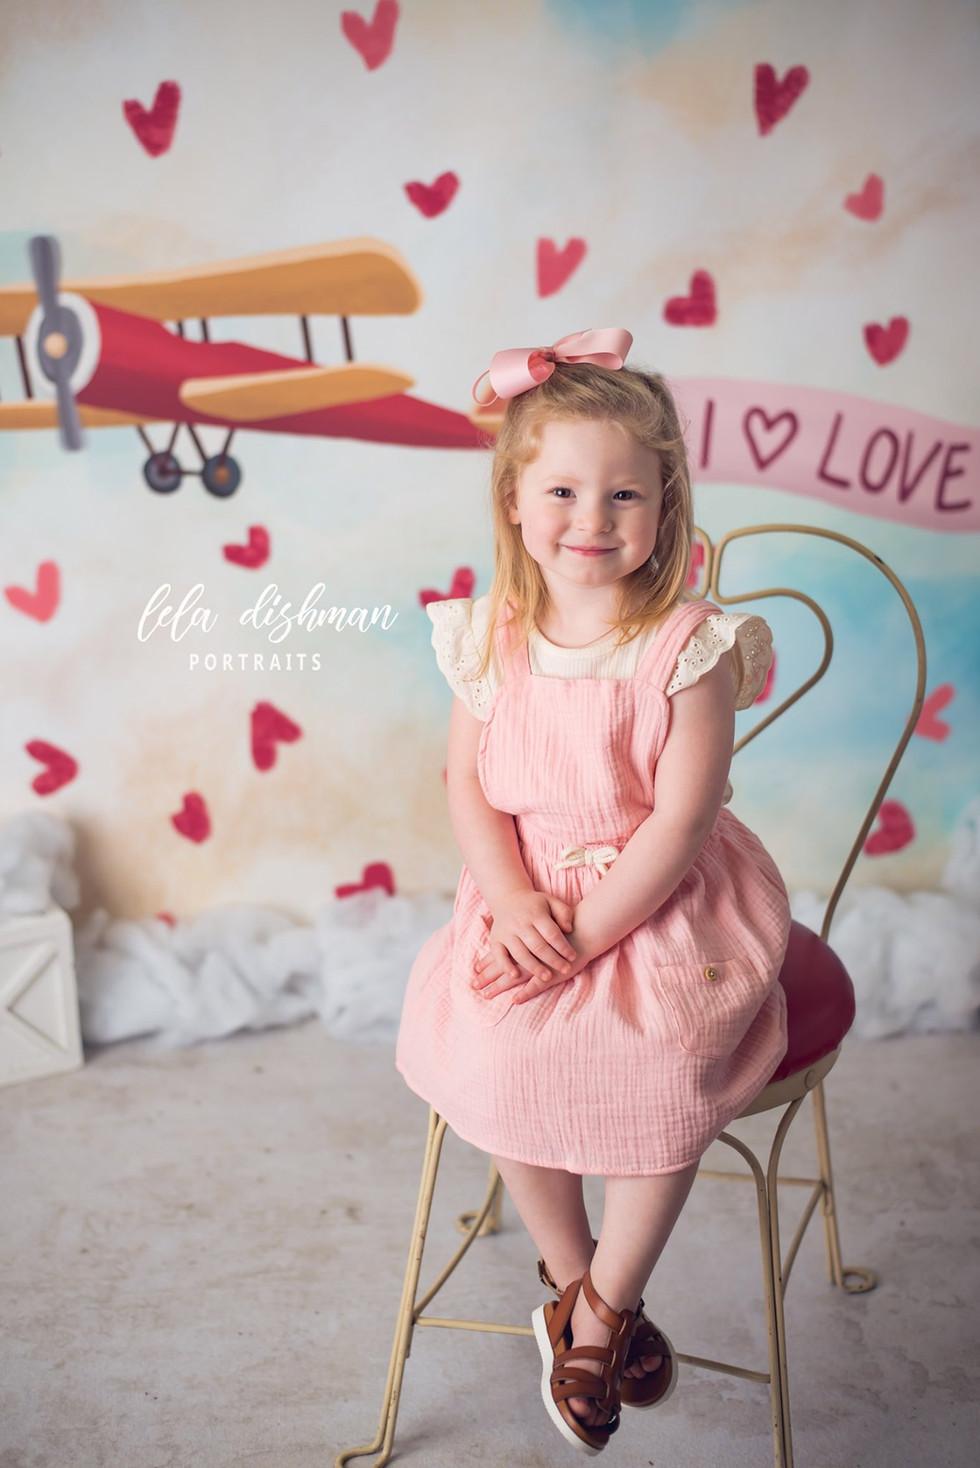 Valentines Mini Session { Monticello, Somerset KY Photographer} Lela Dishman Portraits